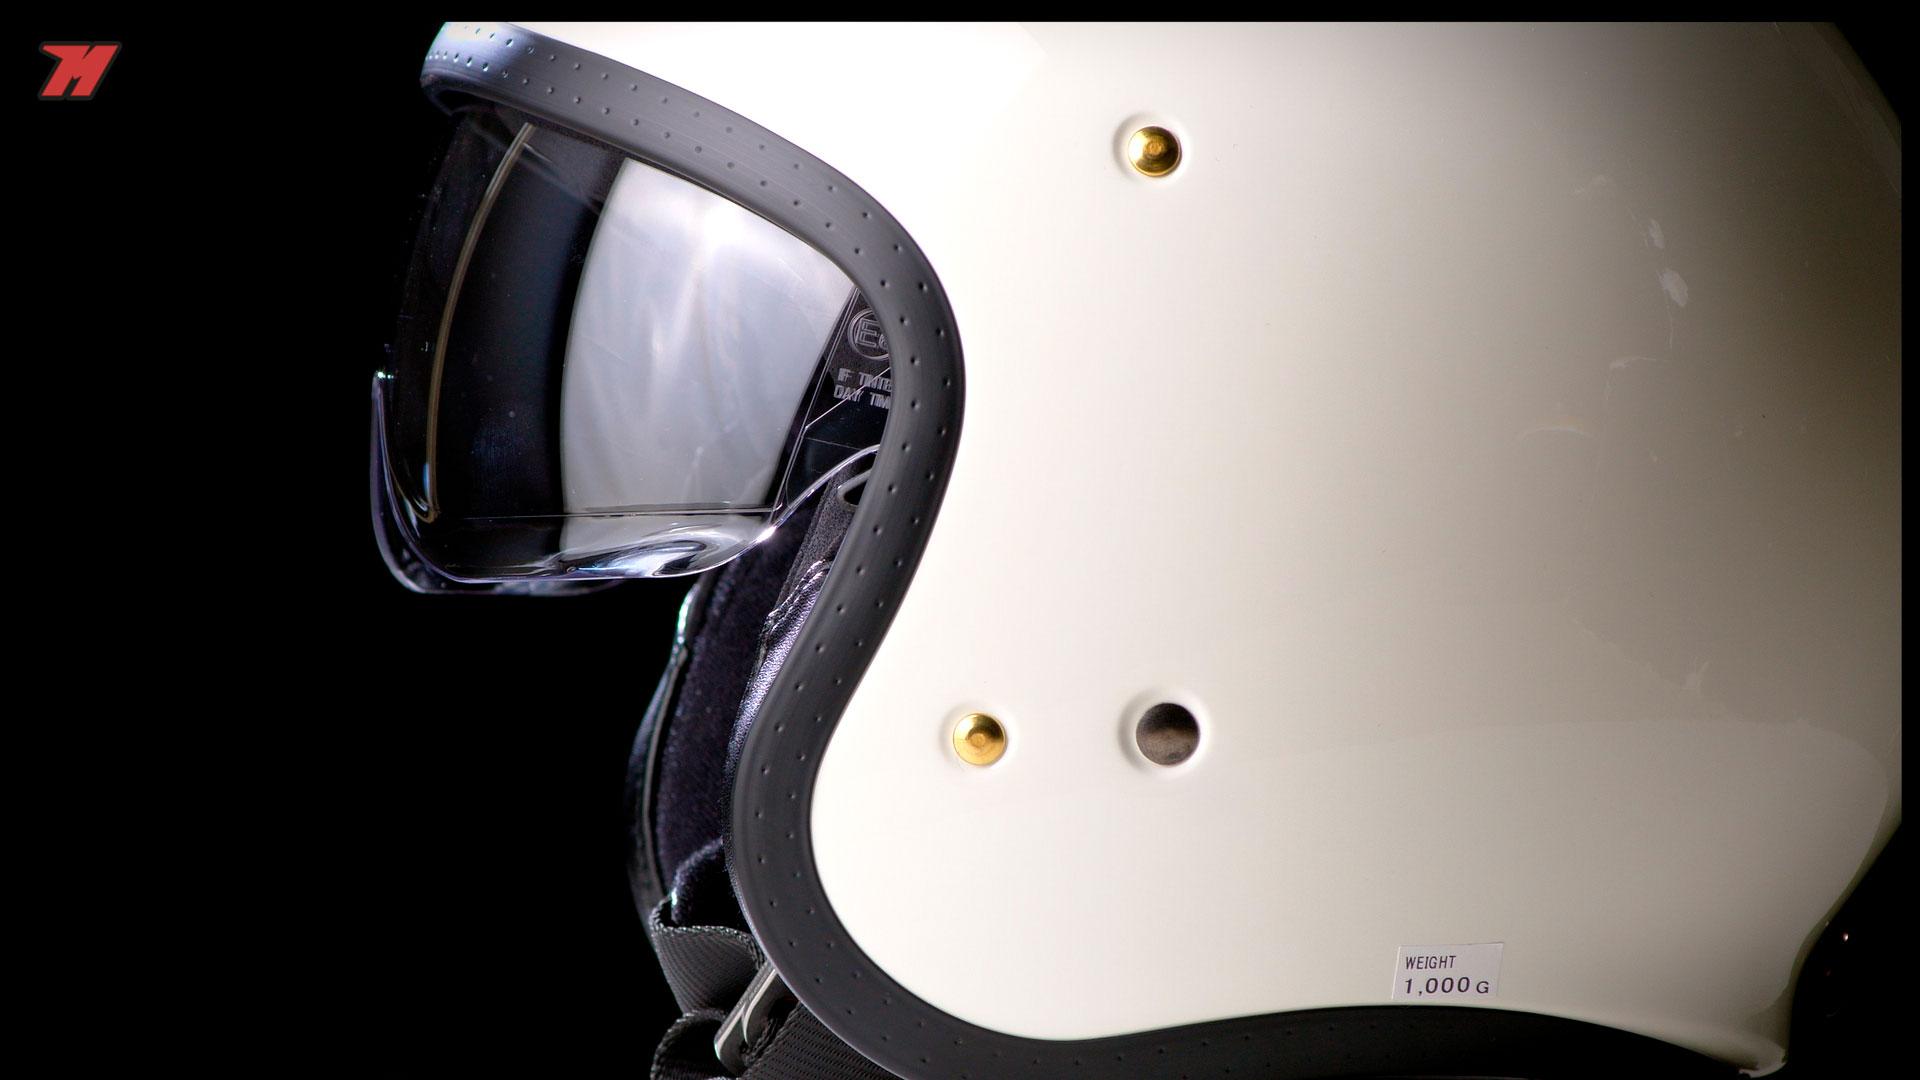 Rider Motorcycle Jet Helmet Glasses Retro Safety Racer Cruiser Roller Goggles